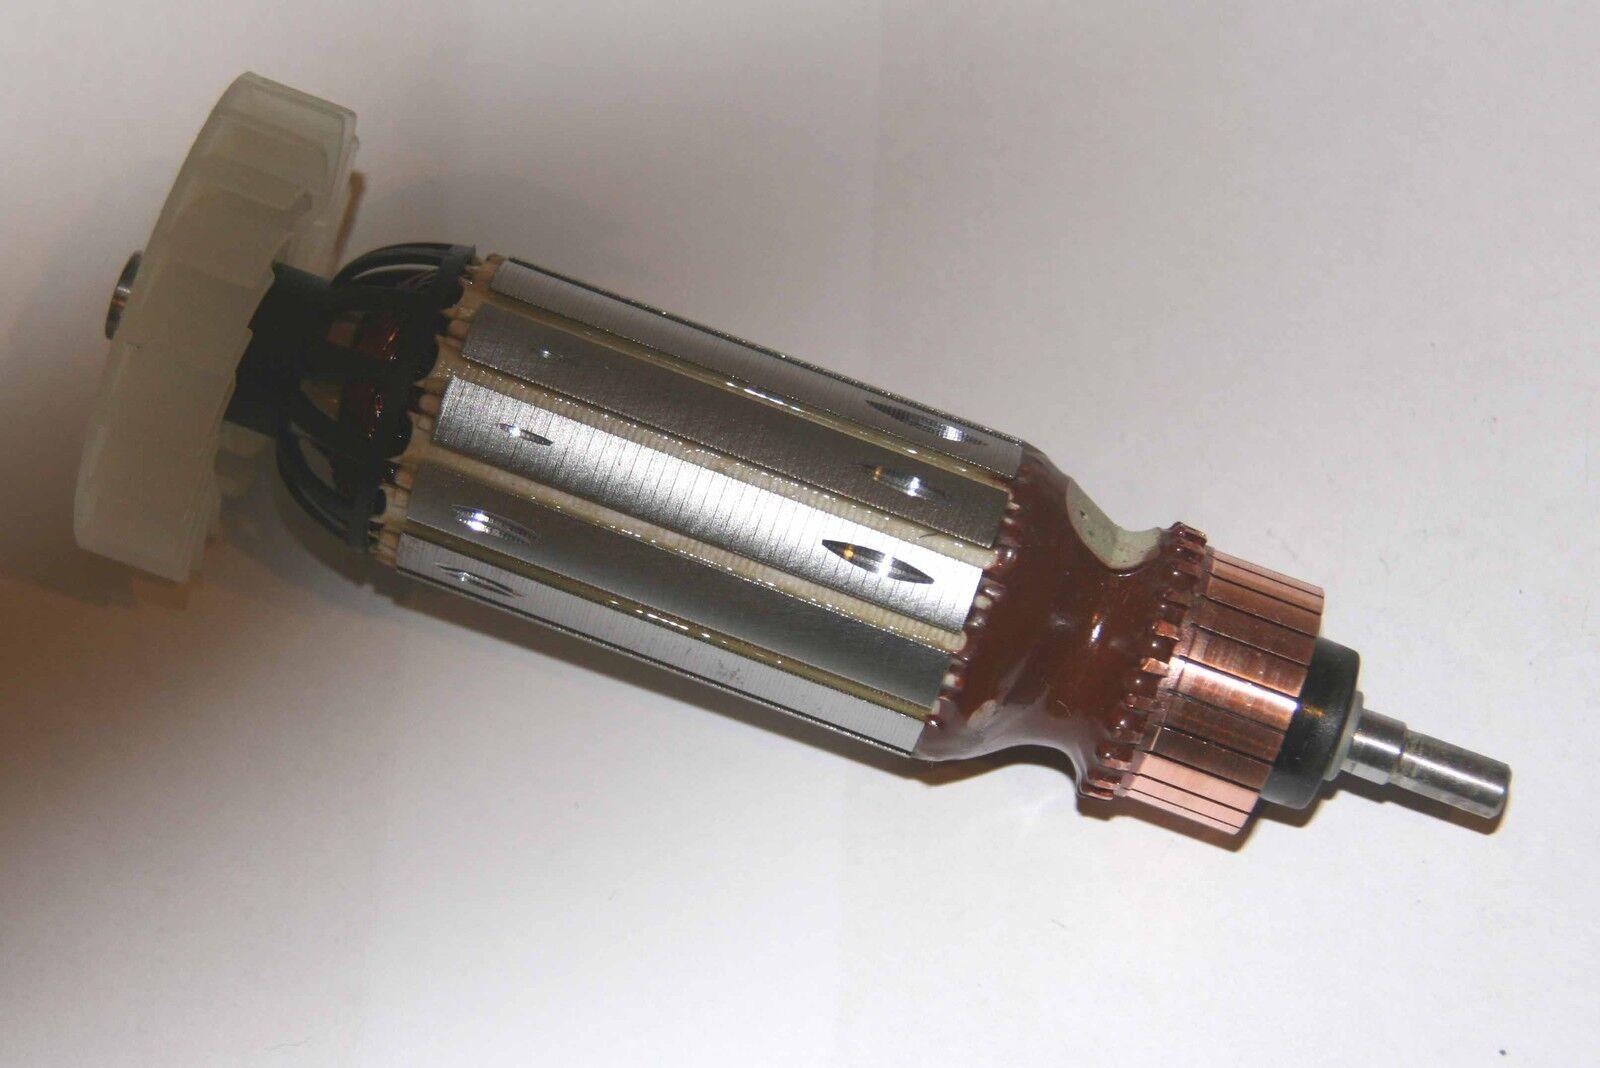 Anker Rotor Flex LD 1709 FR LDC 1709 FR LDB 1709 FR RE 14-5 RETECFLEX